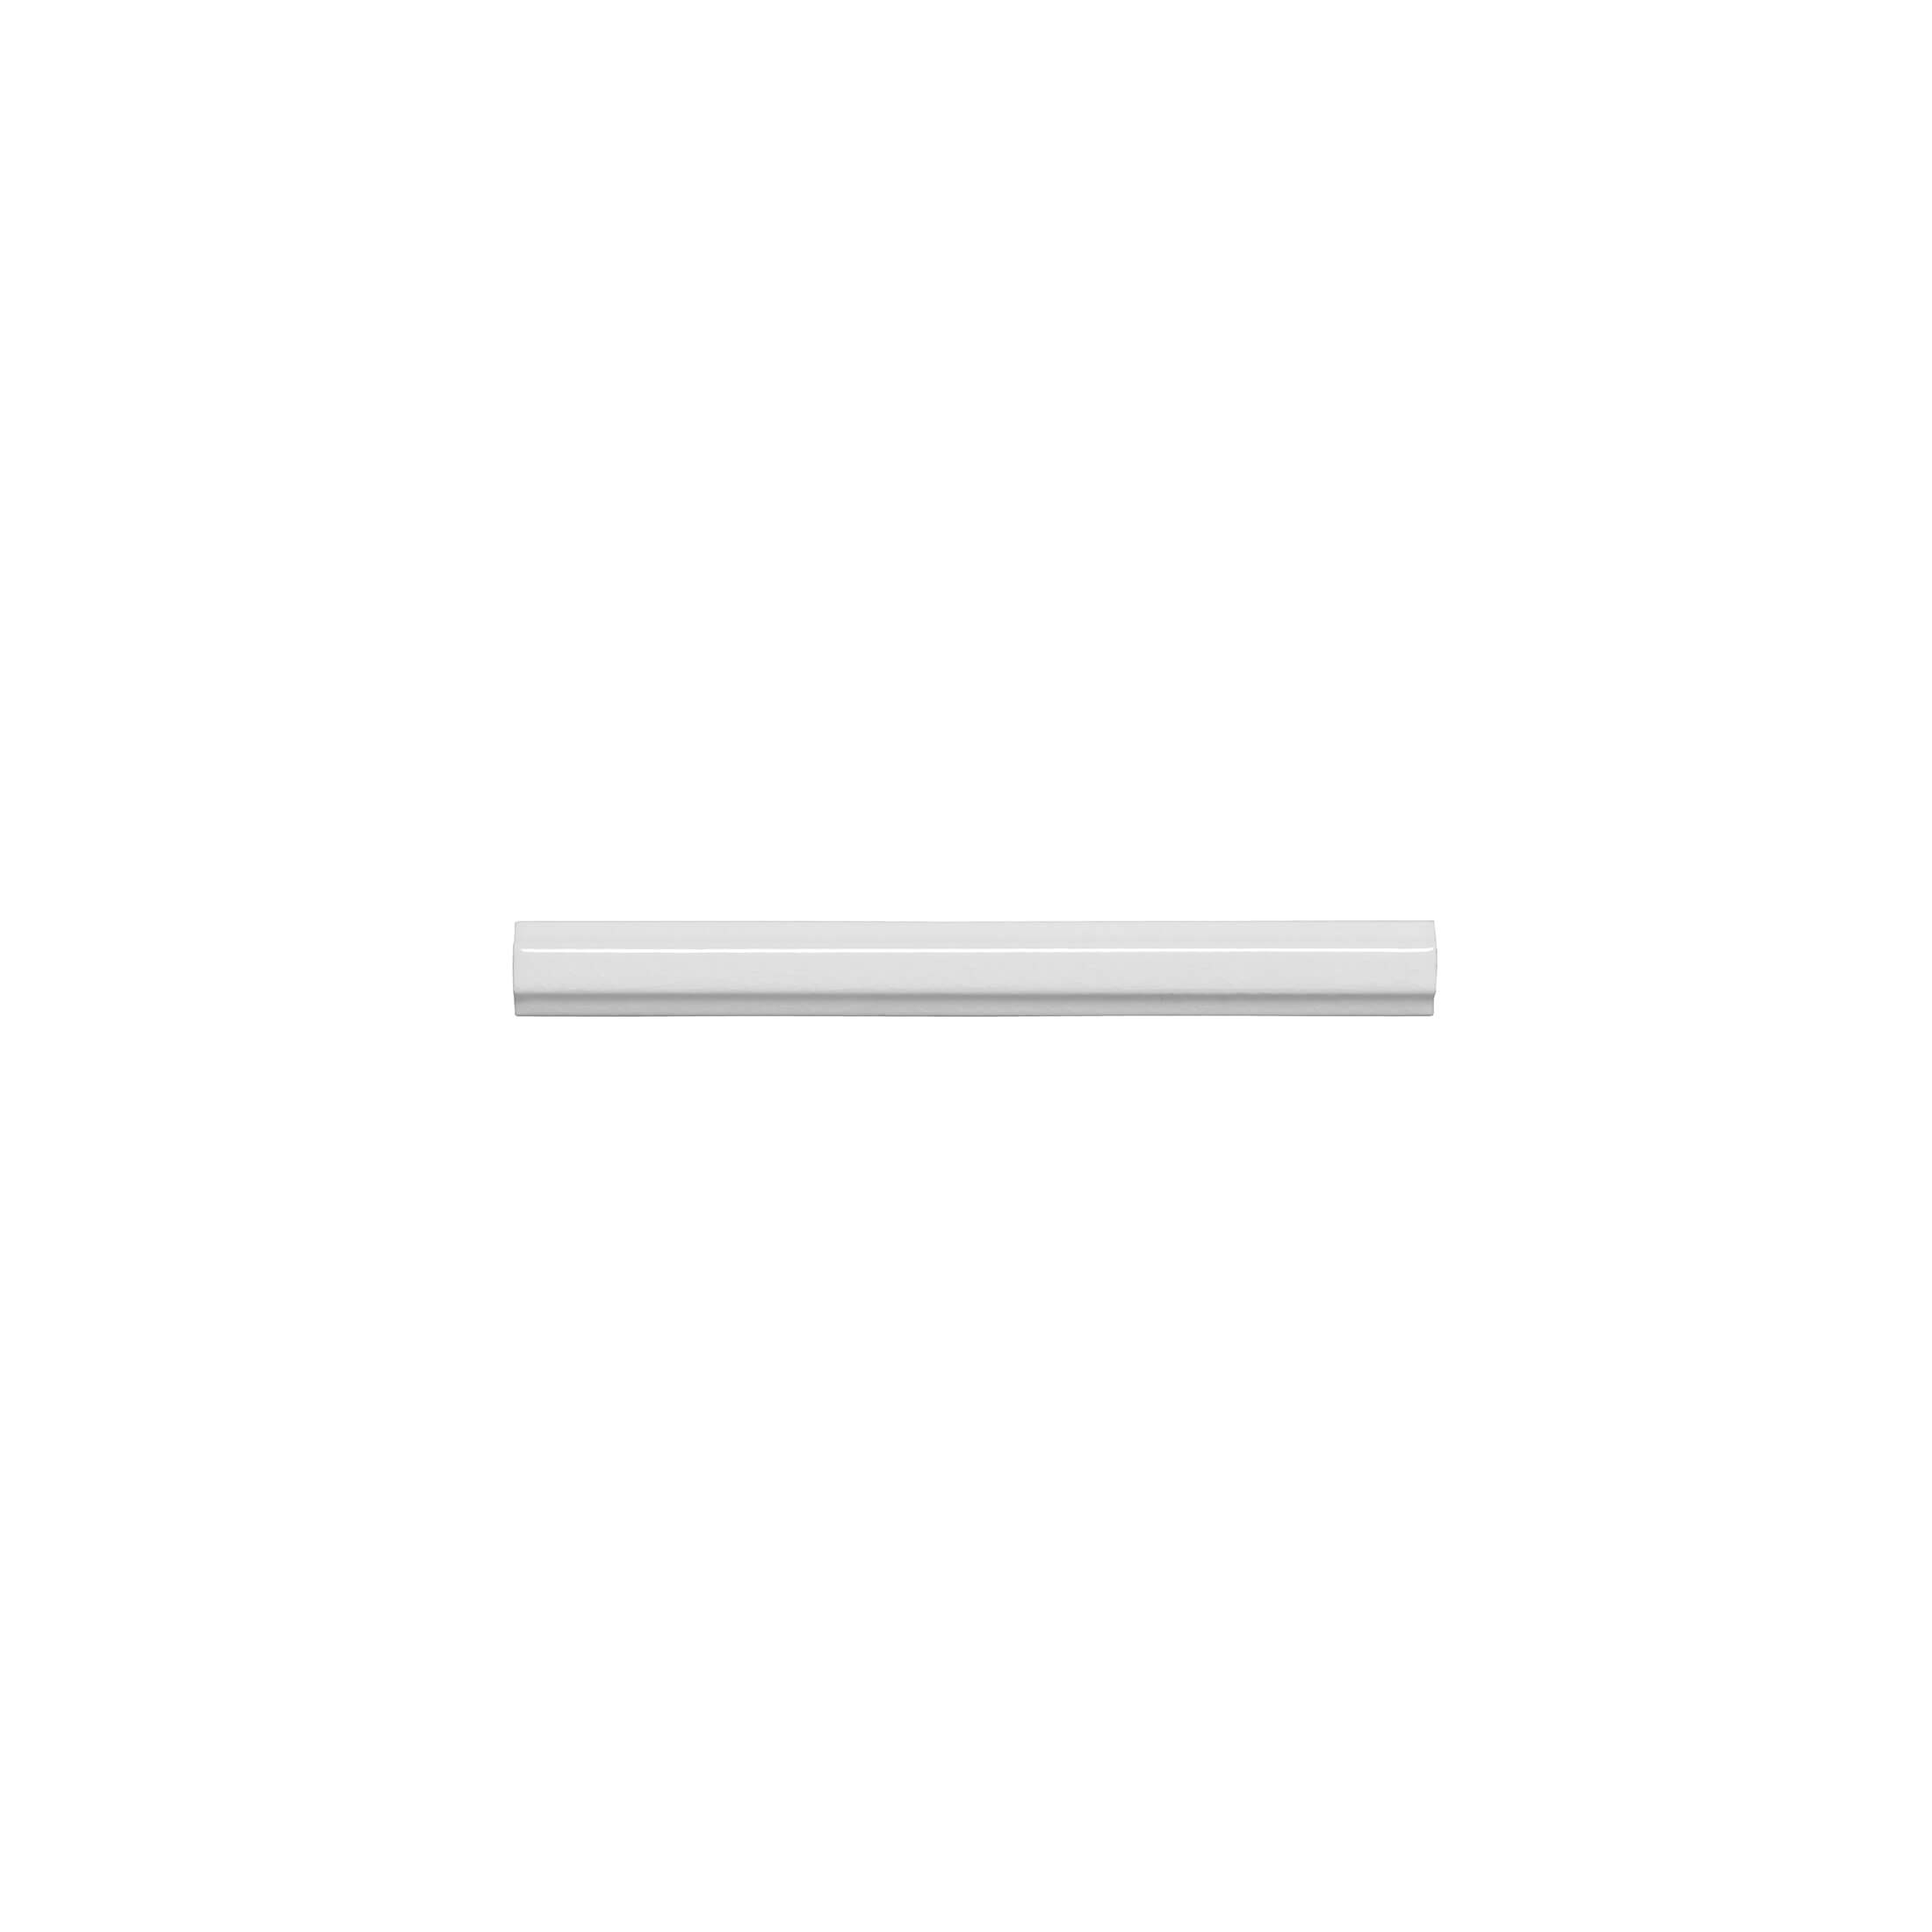 ADEX-ADMO5265-LISTELO-CLASICO C/C   -1.7 cm-15 cm-MODERNISTA>BLANCO